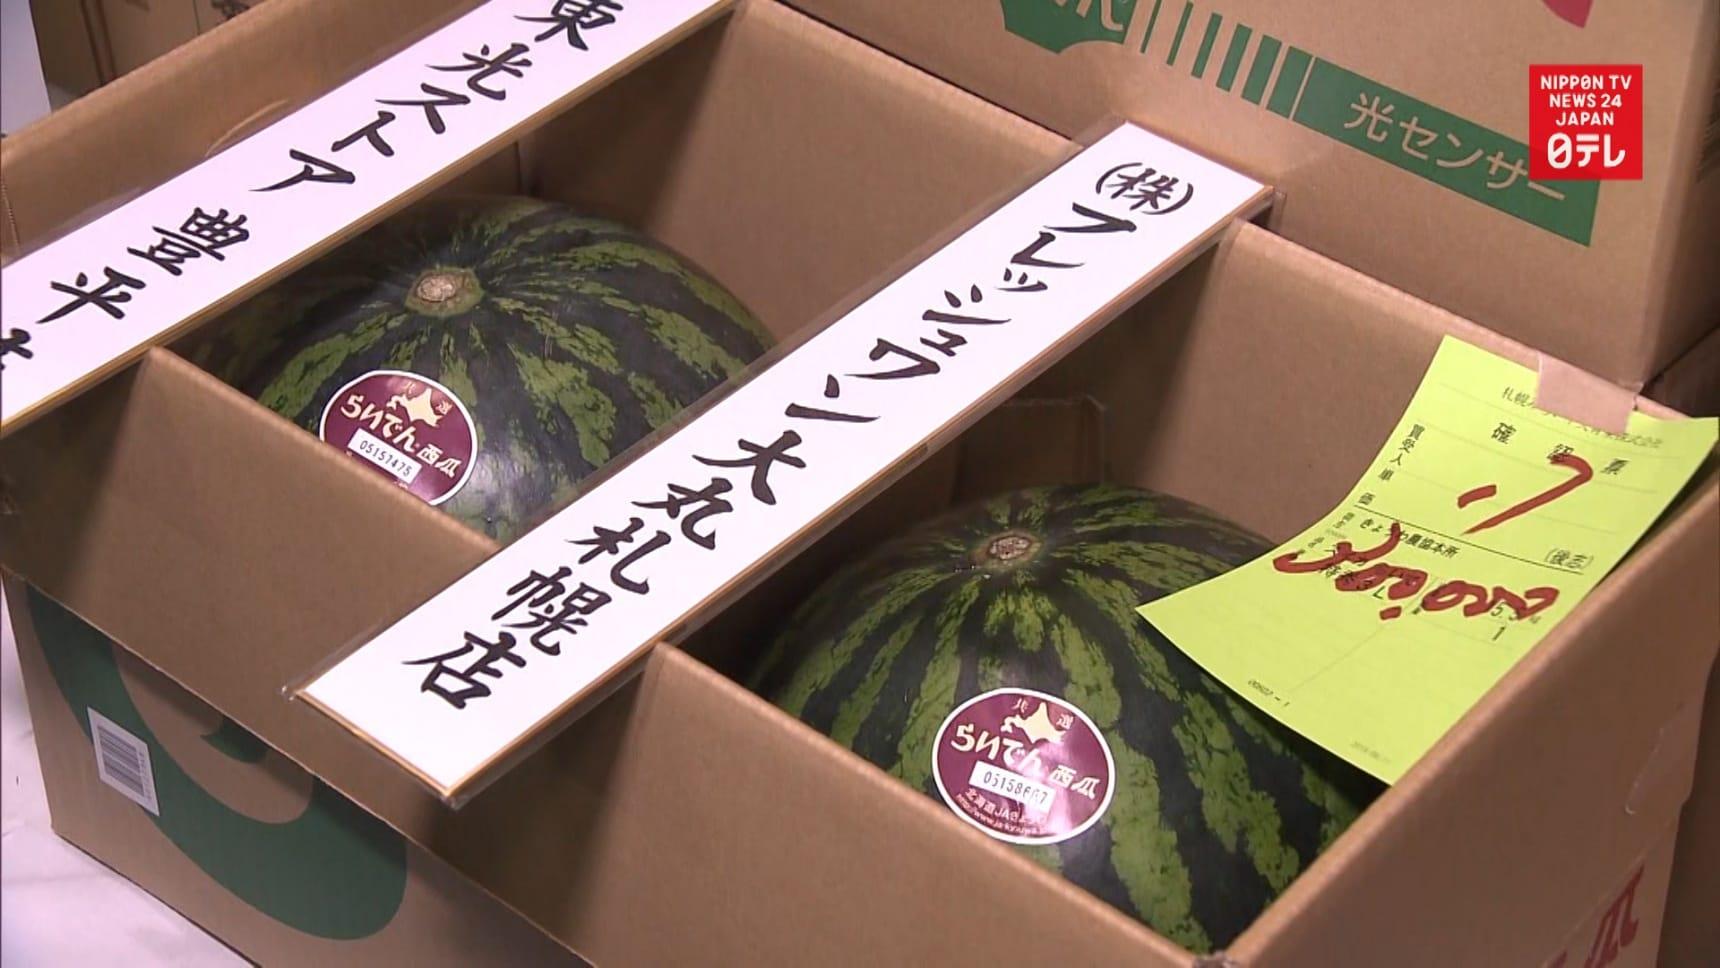 Japan's Super Expensive Seasonal Watermelons